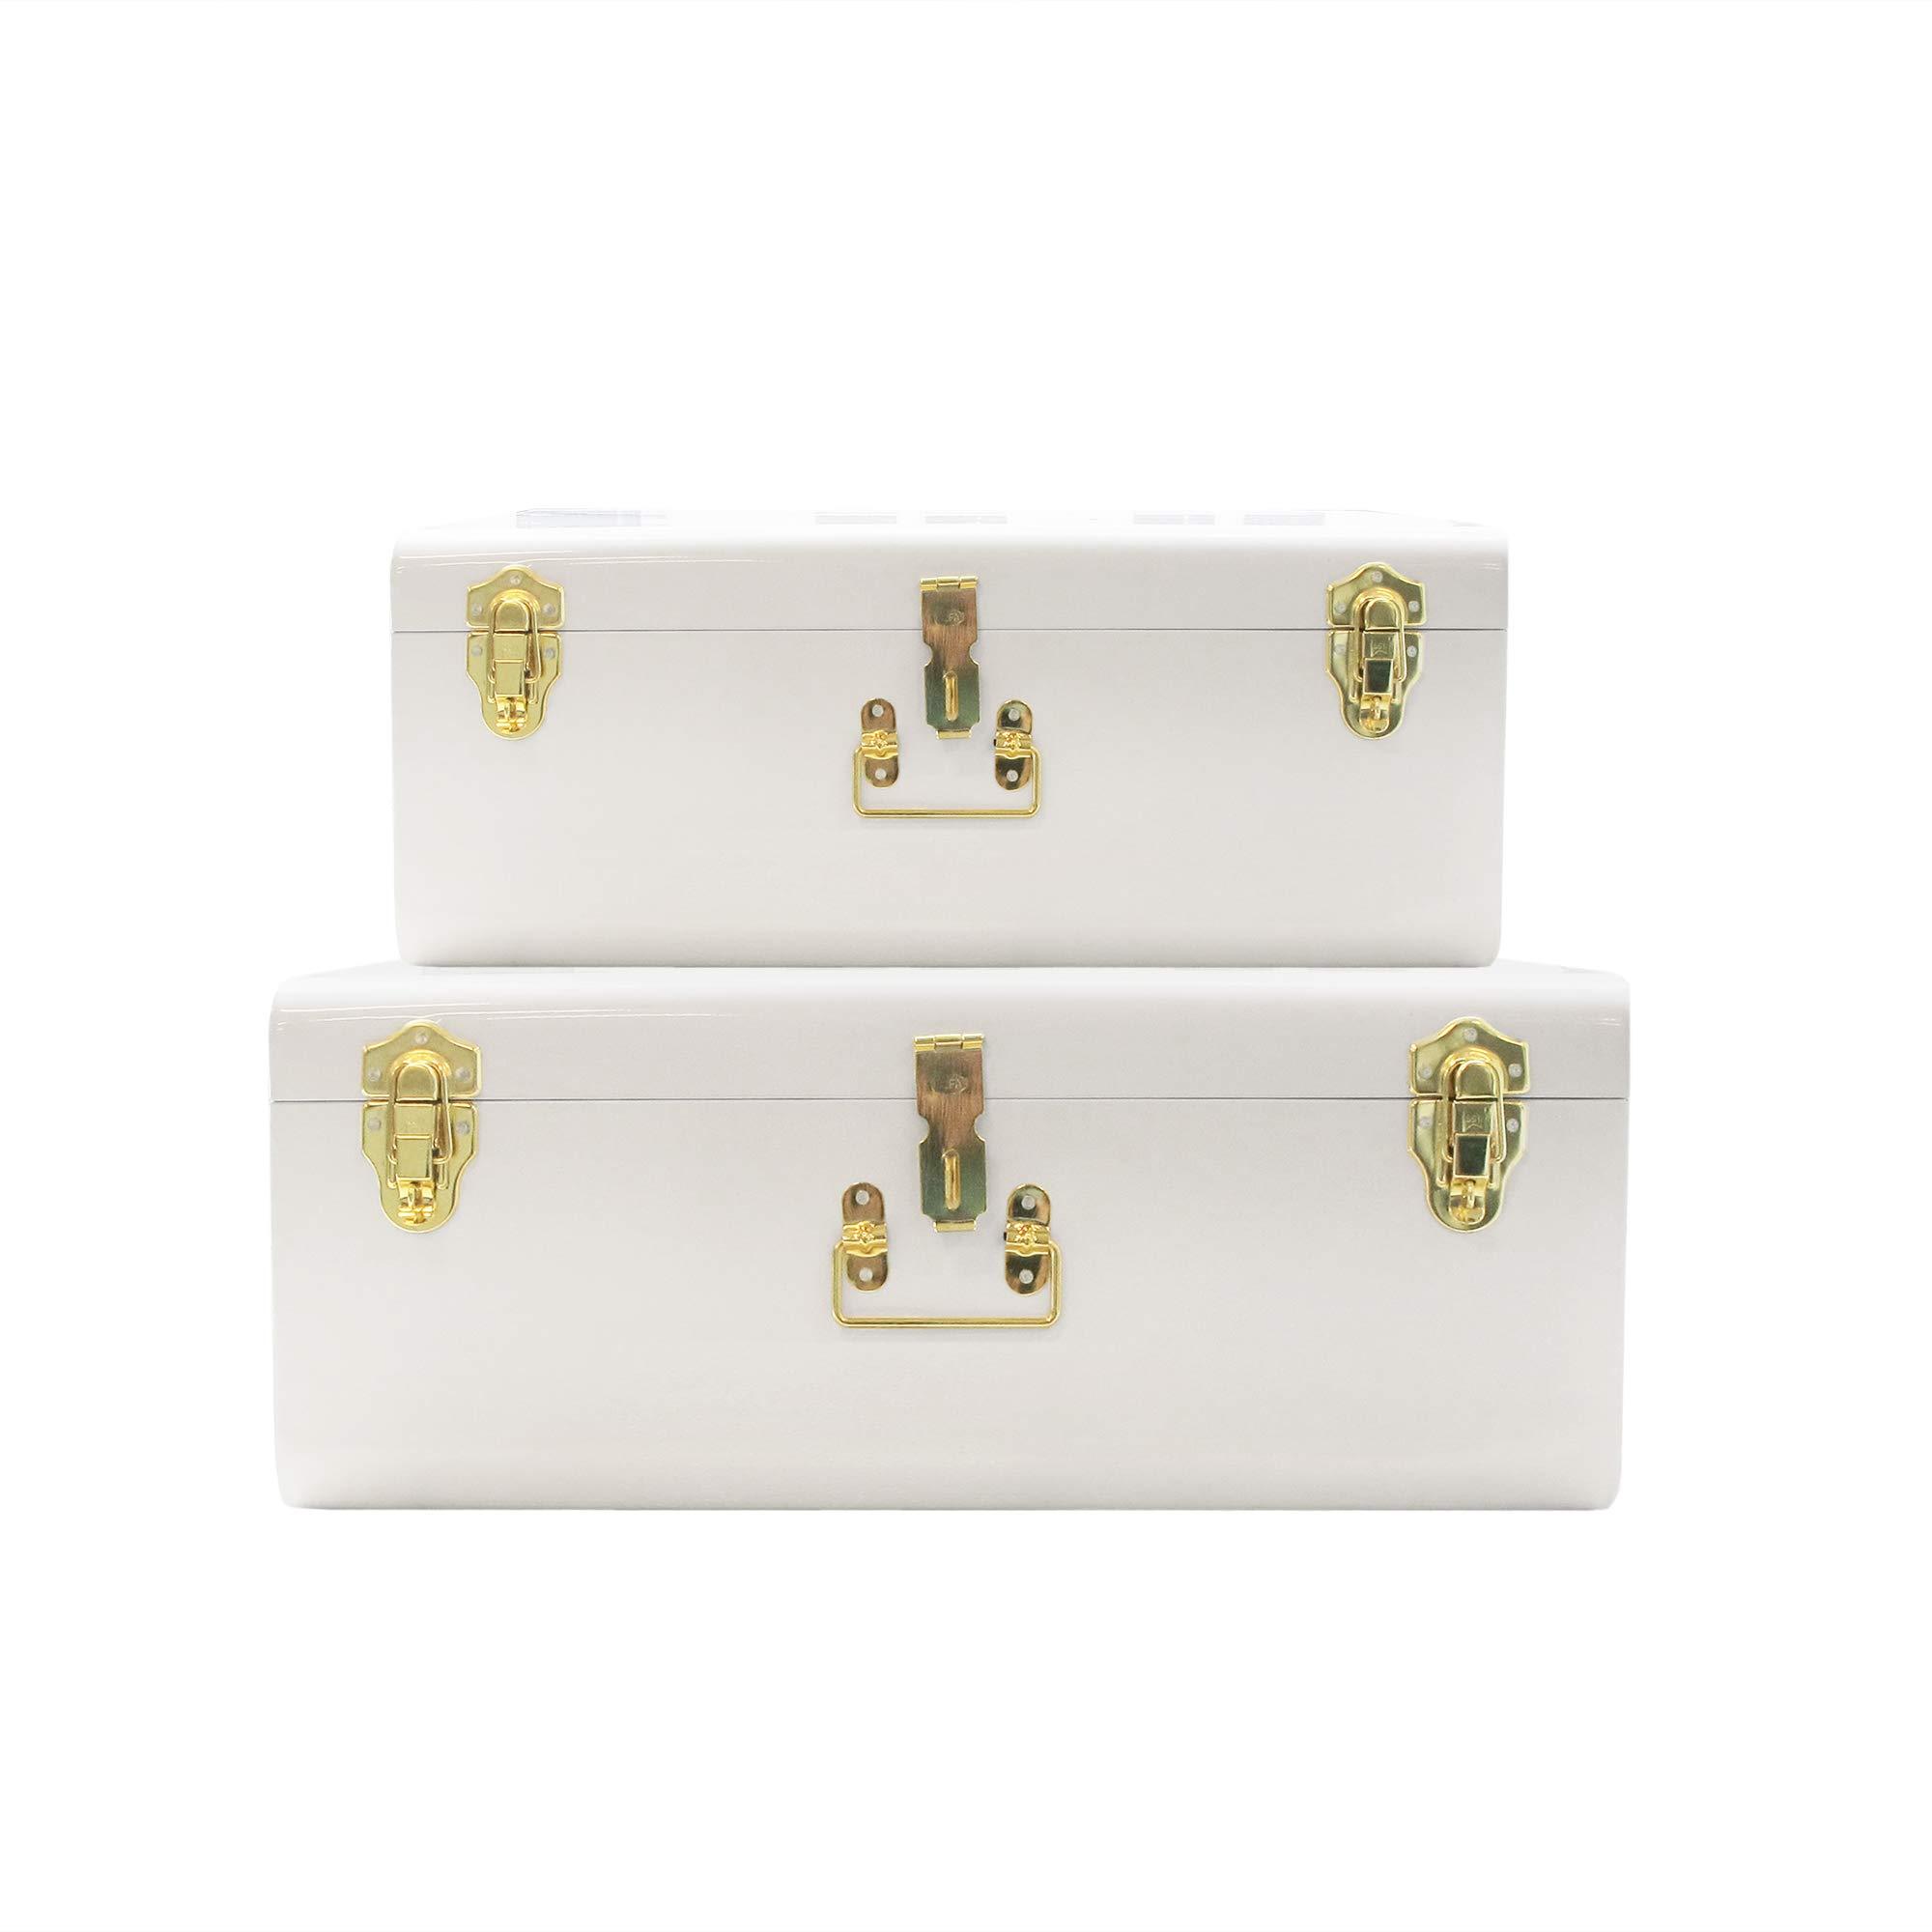 Zanzer White Trunks Set of 2 - Vintage Style Storage w/Gold Finish Handles & Locks - Space Saving Organizer Home Dorm & Office Use by Zanzer